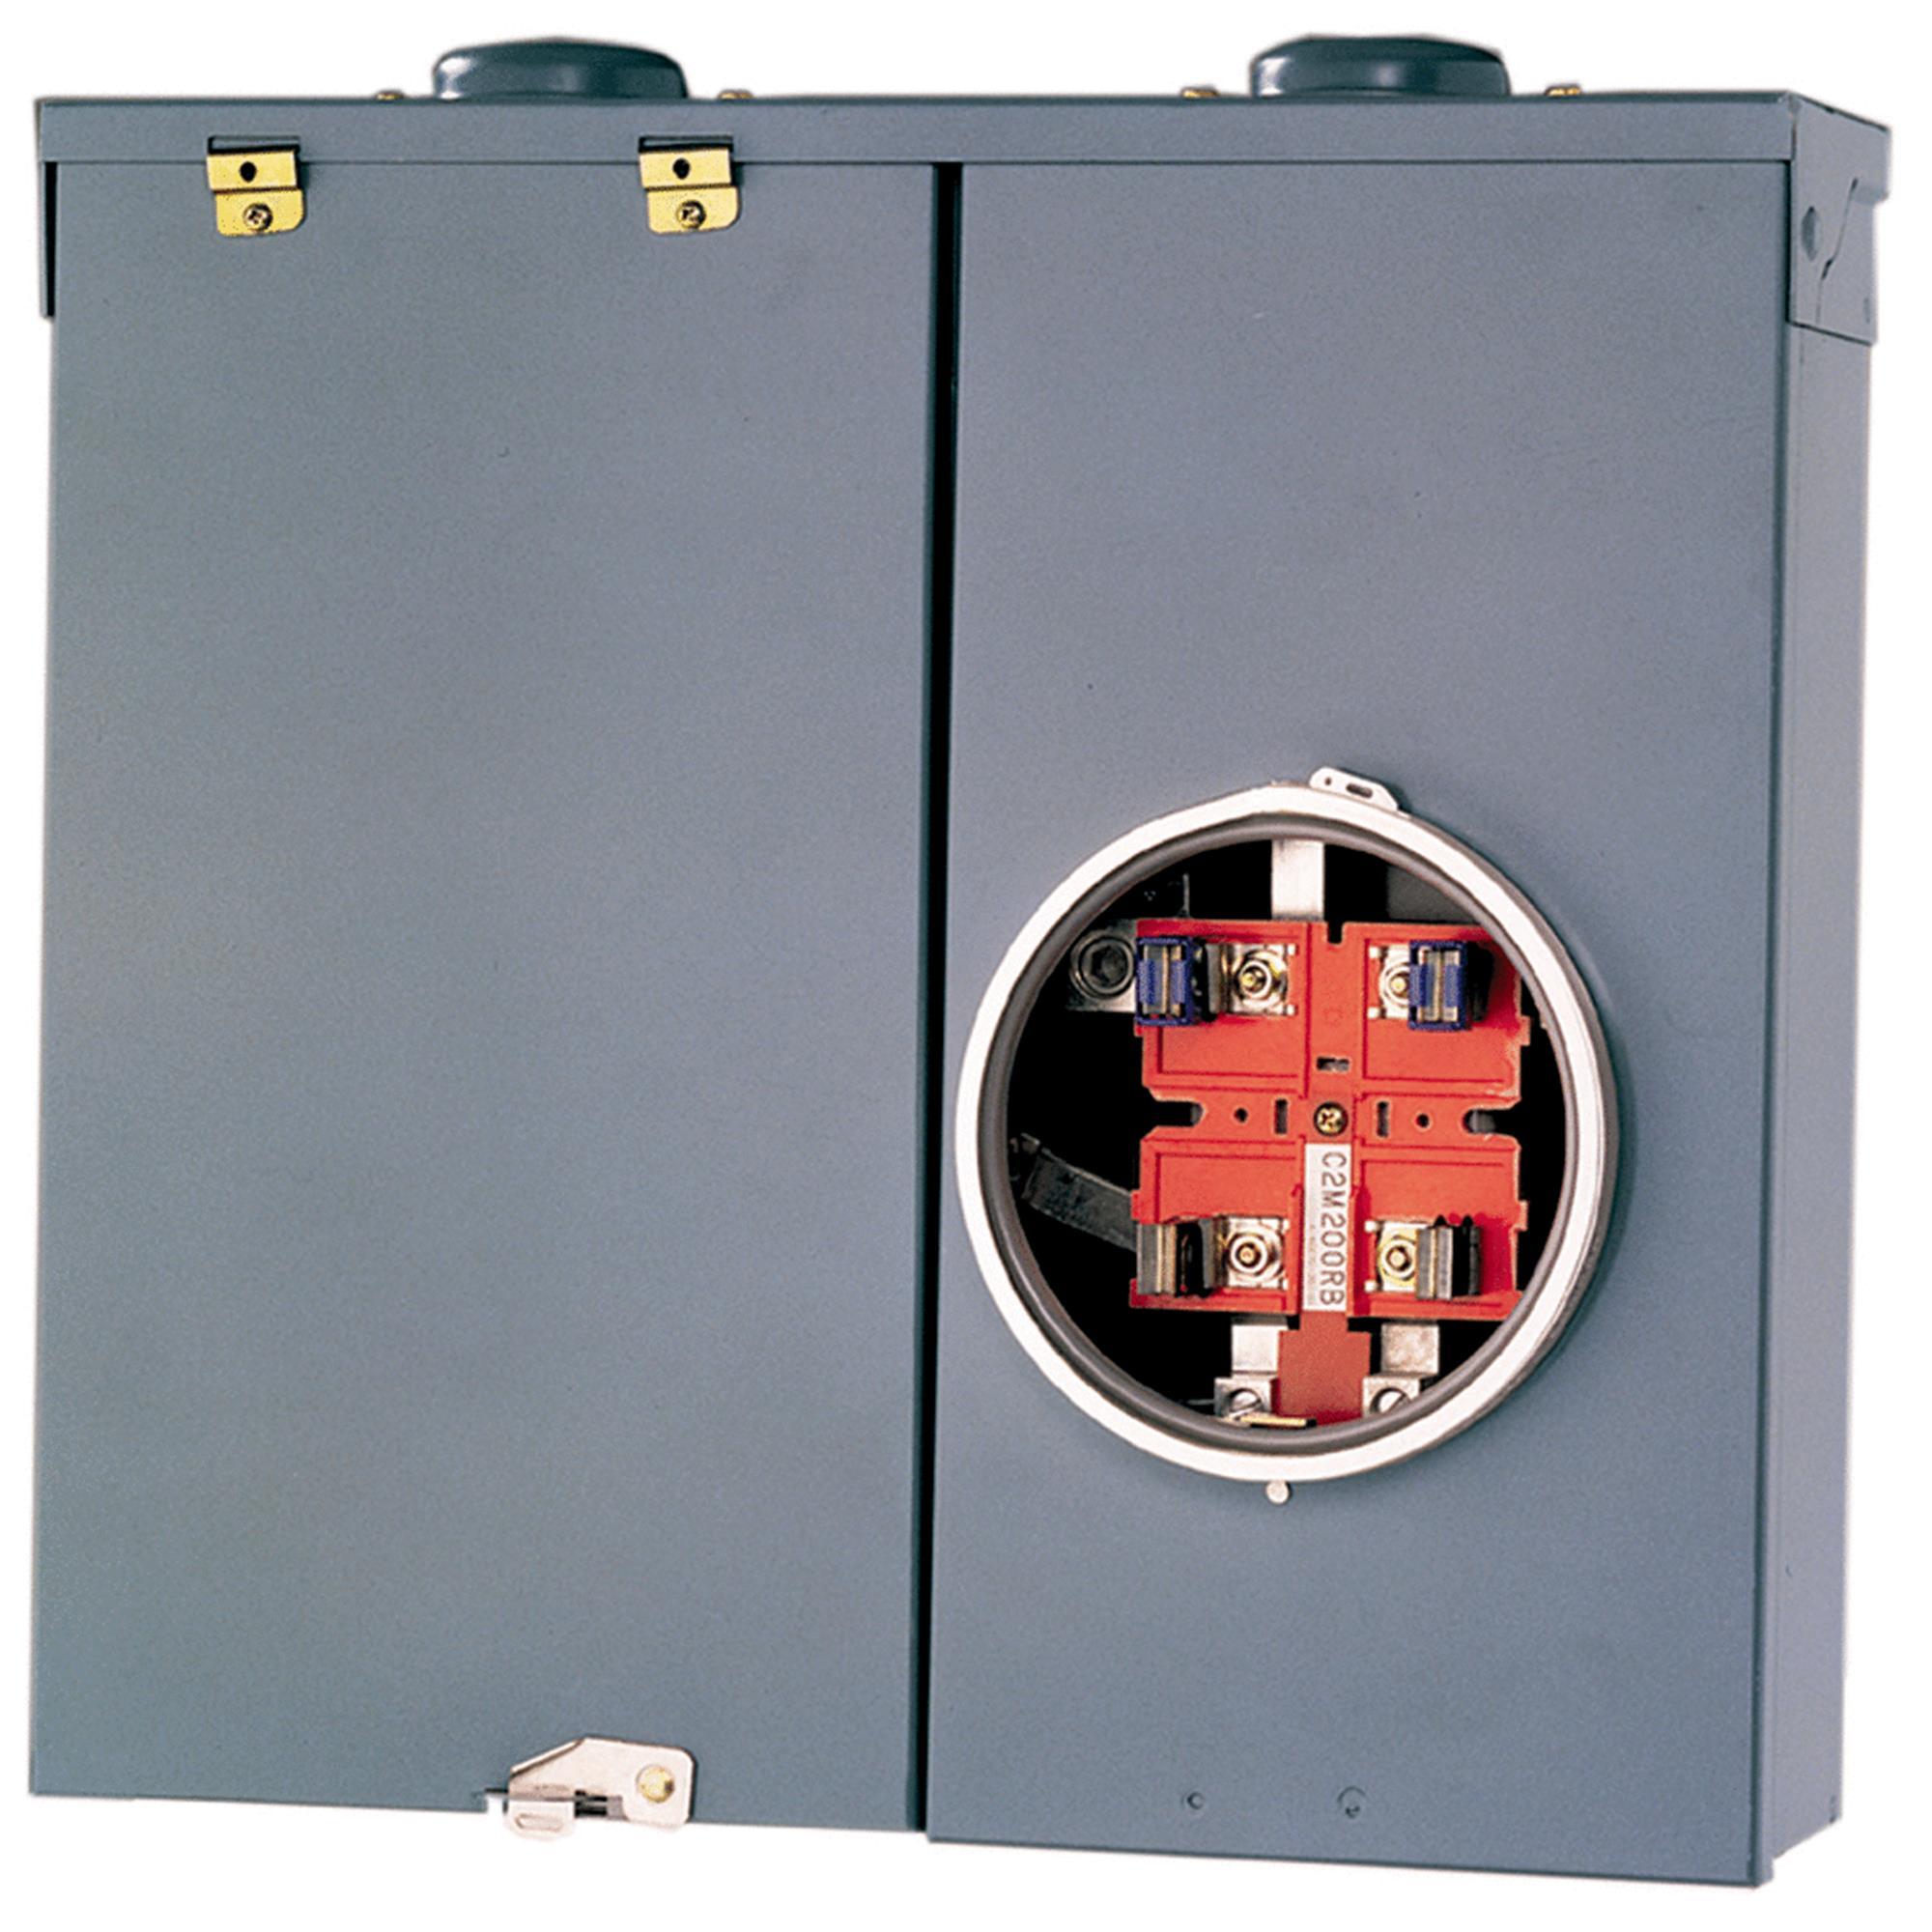 Square D QO CSED Meter Breaker Panel